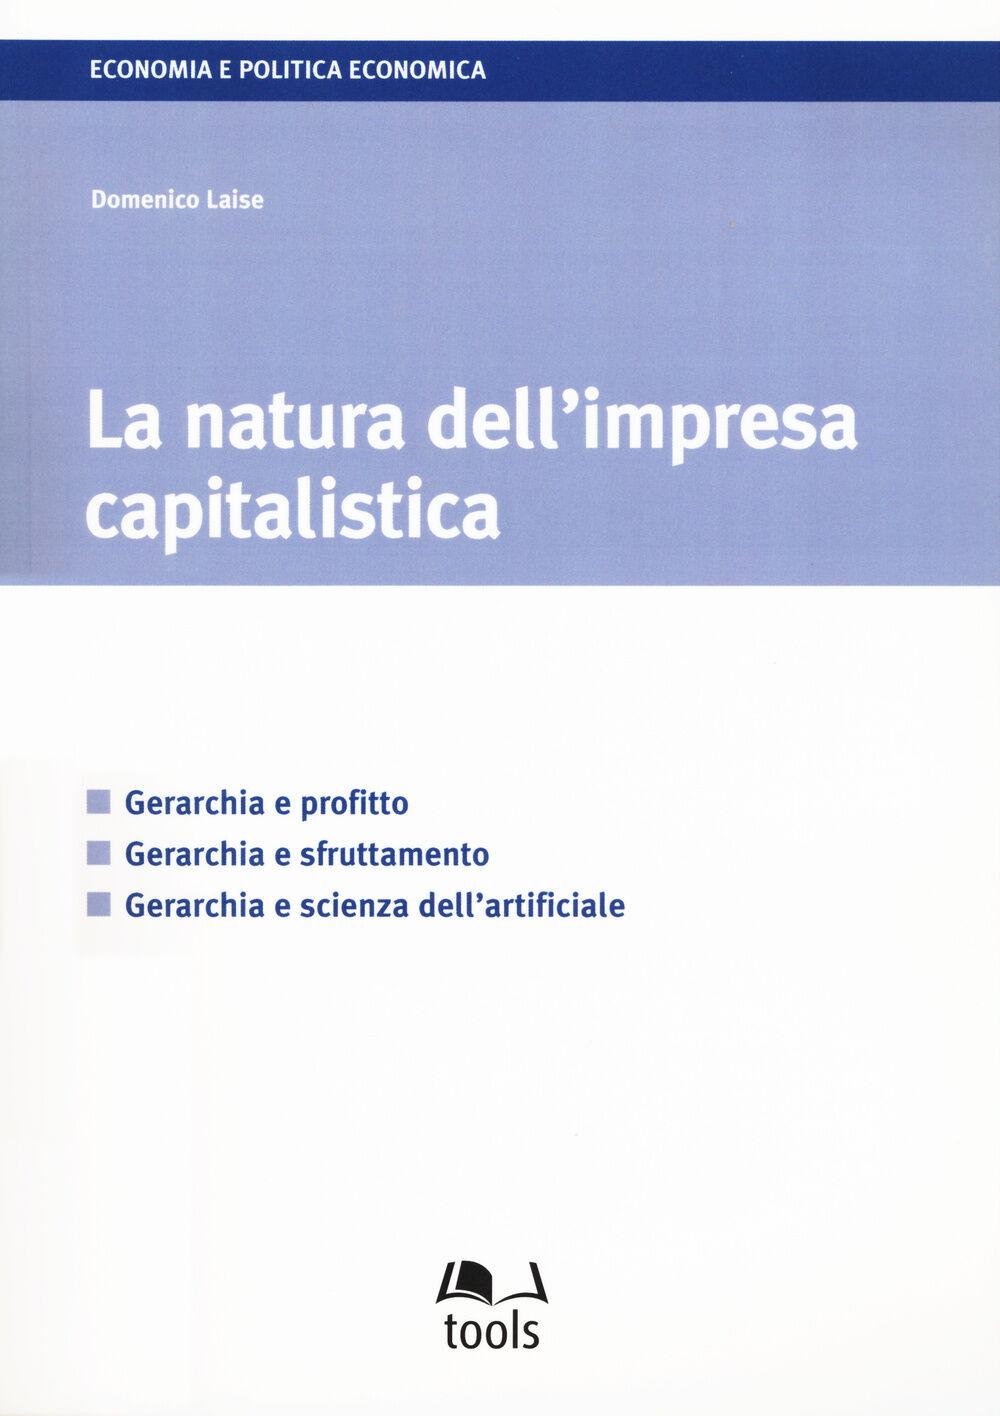 La natura dell'impresa capitalistica